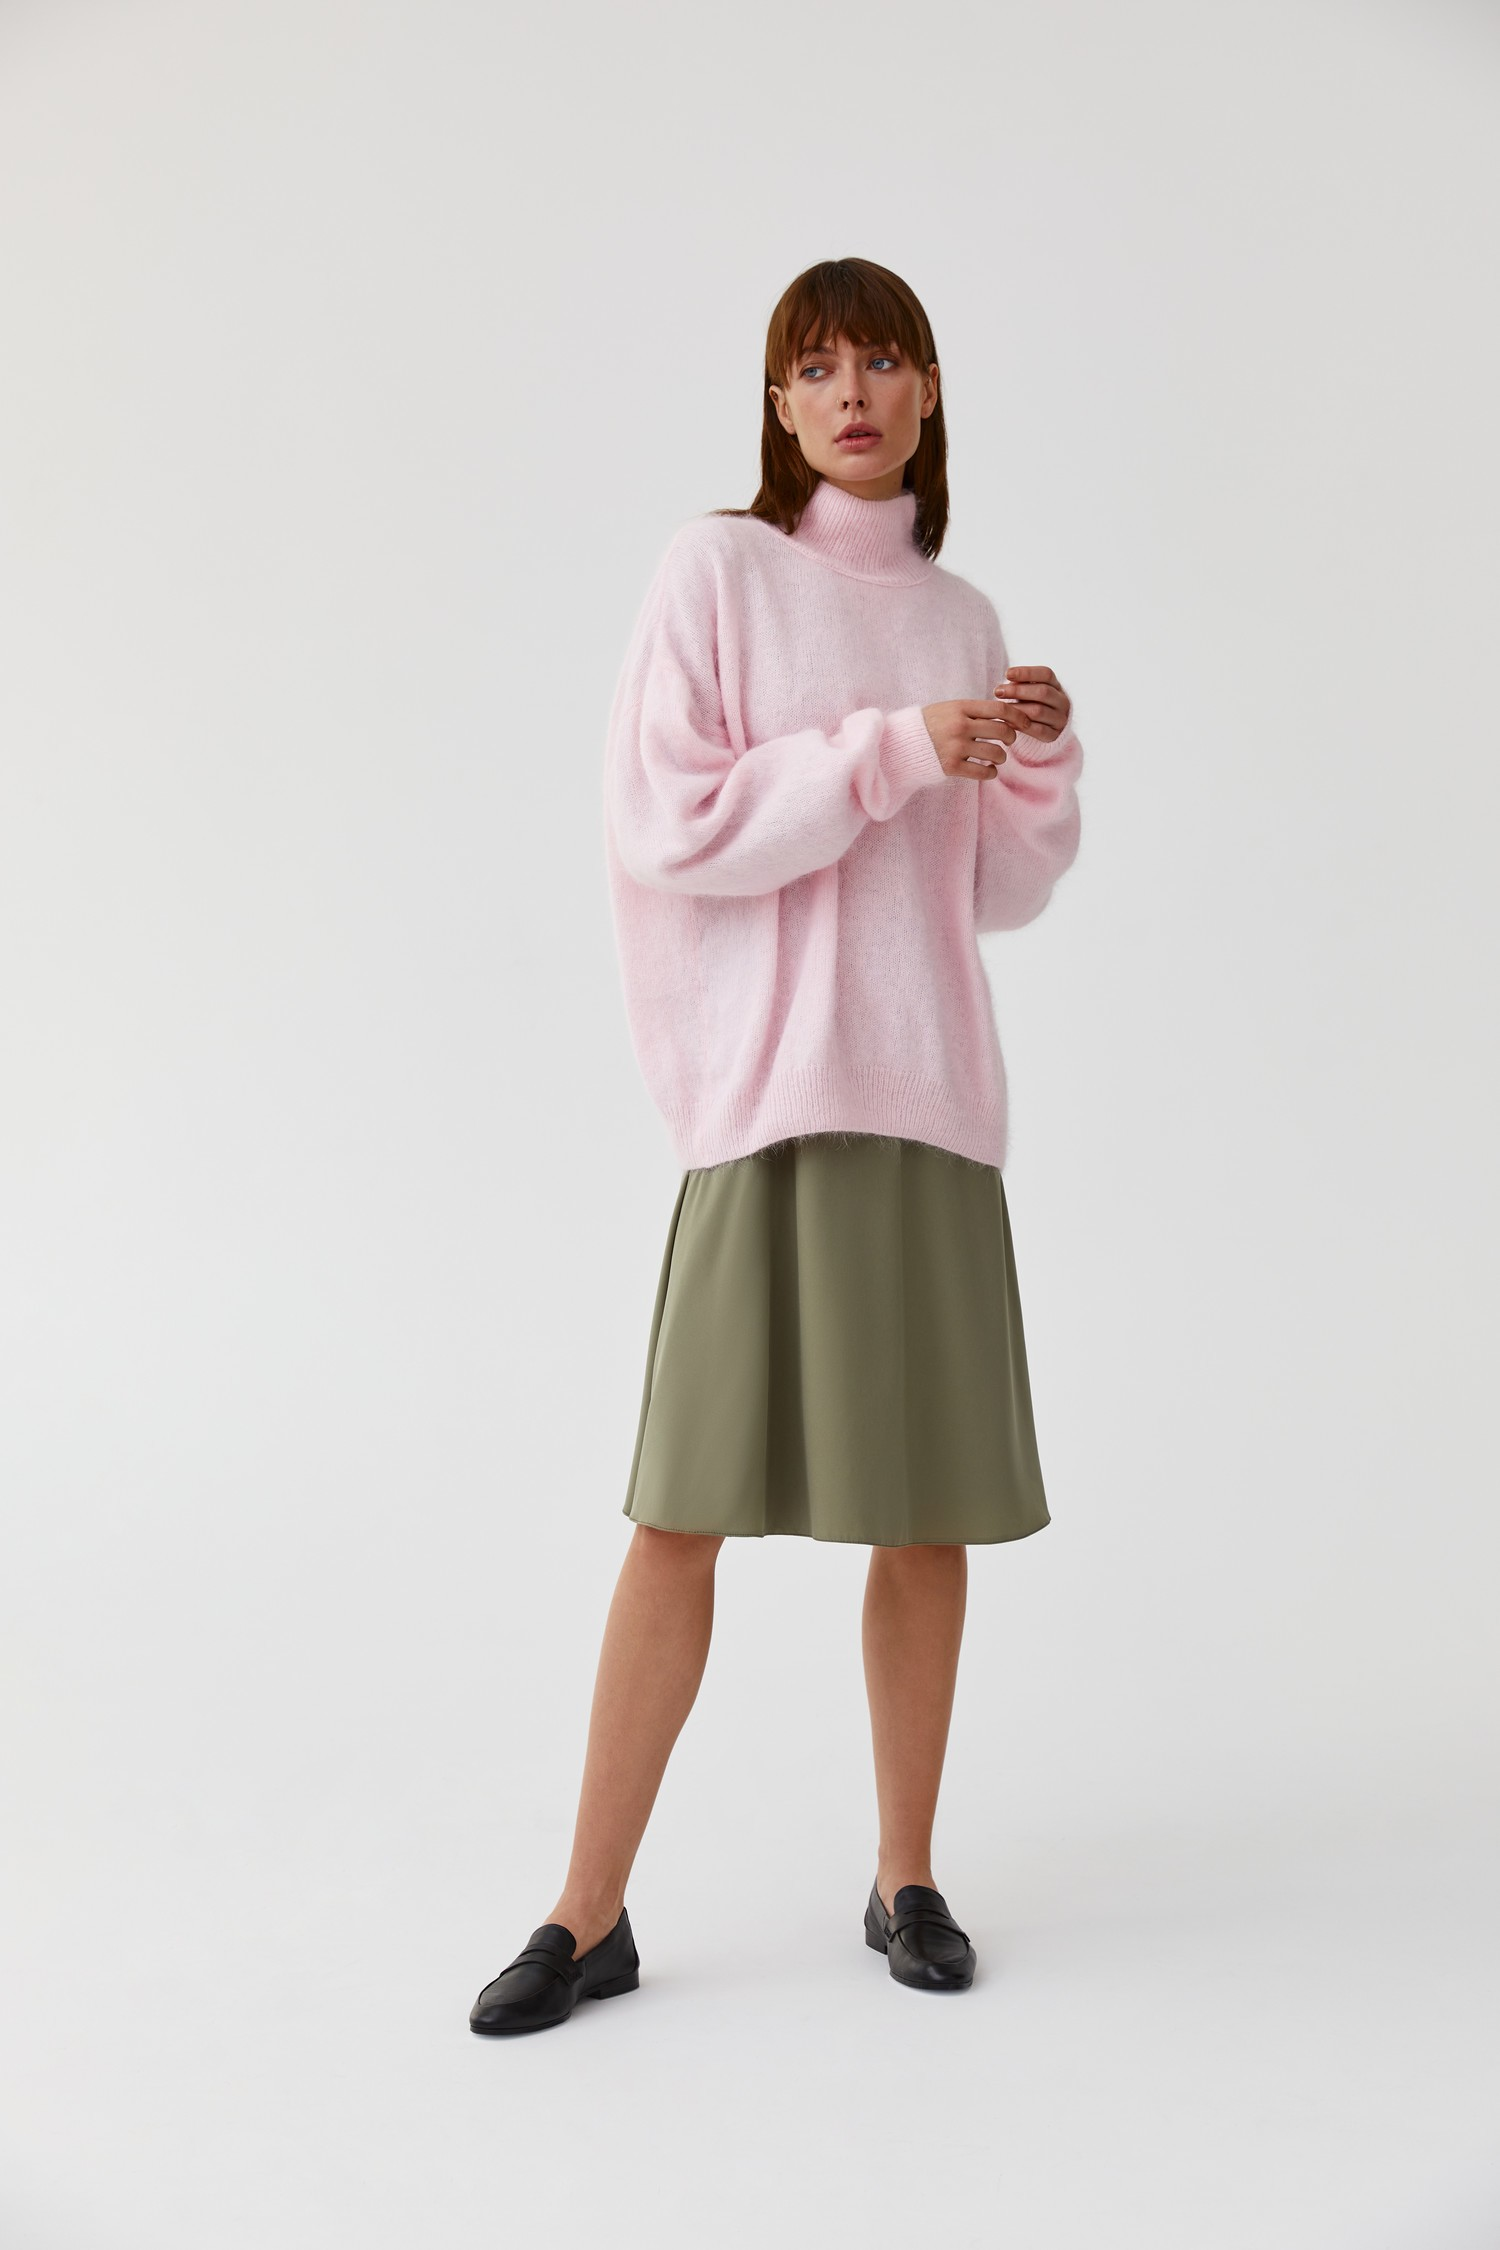 Объемный свитер из ангоры пудровый - THE LACE